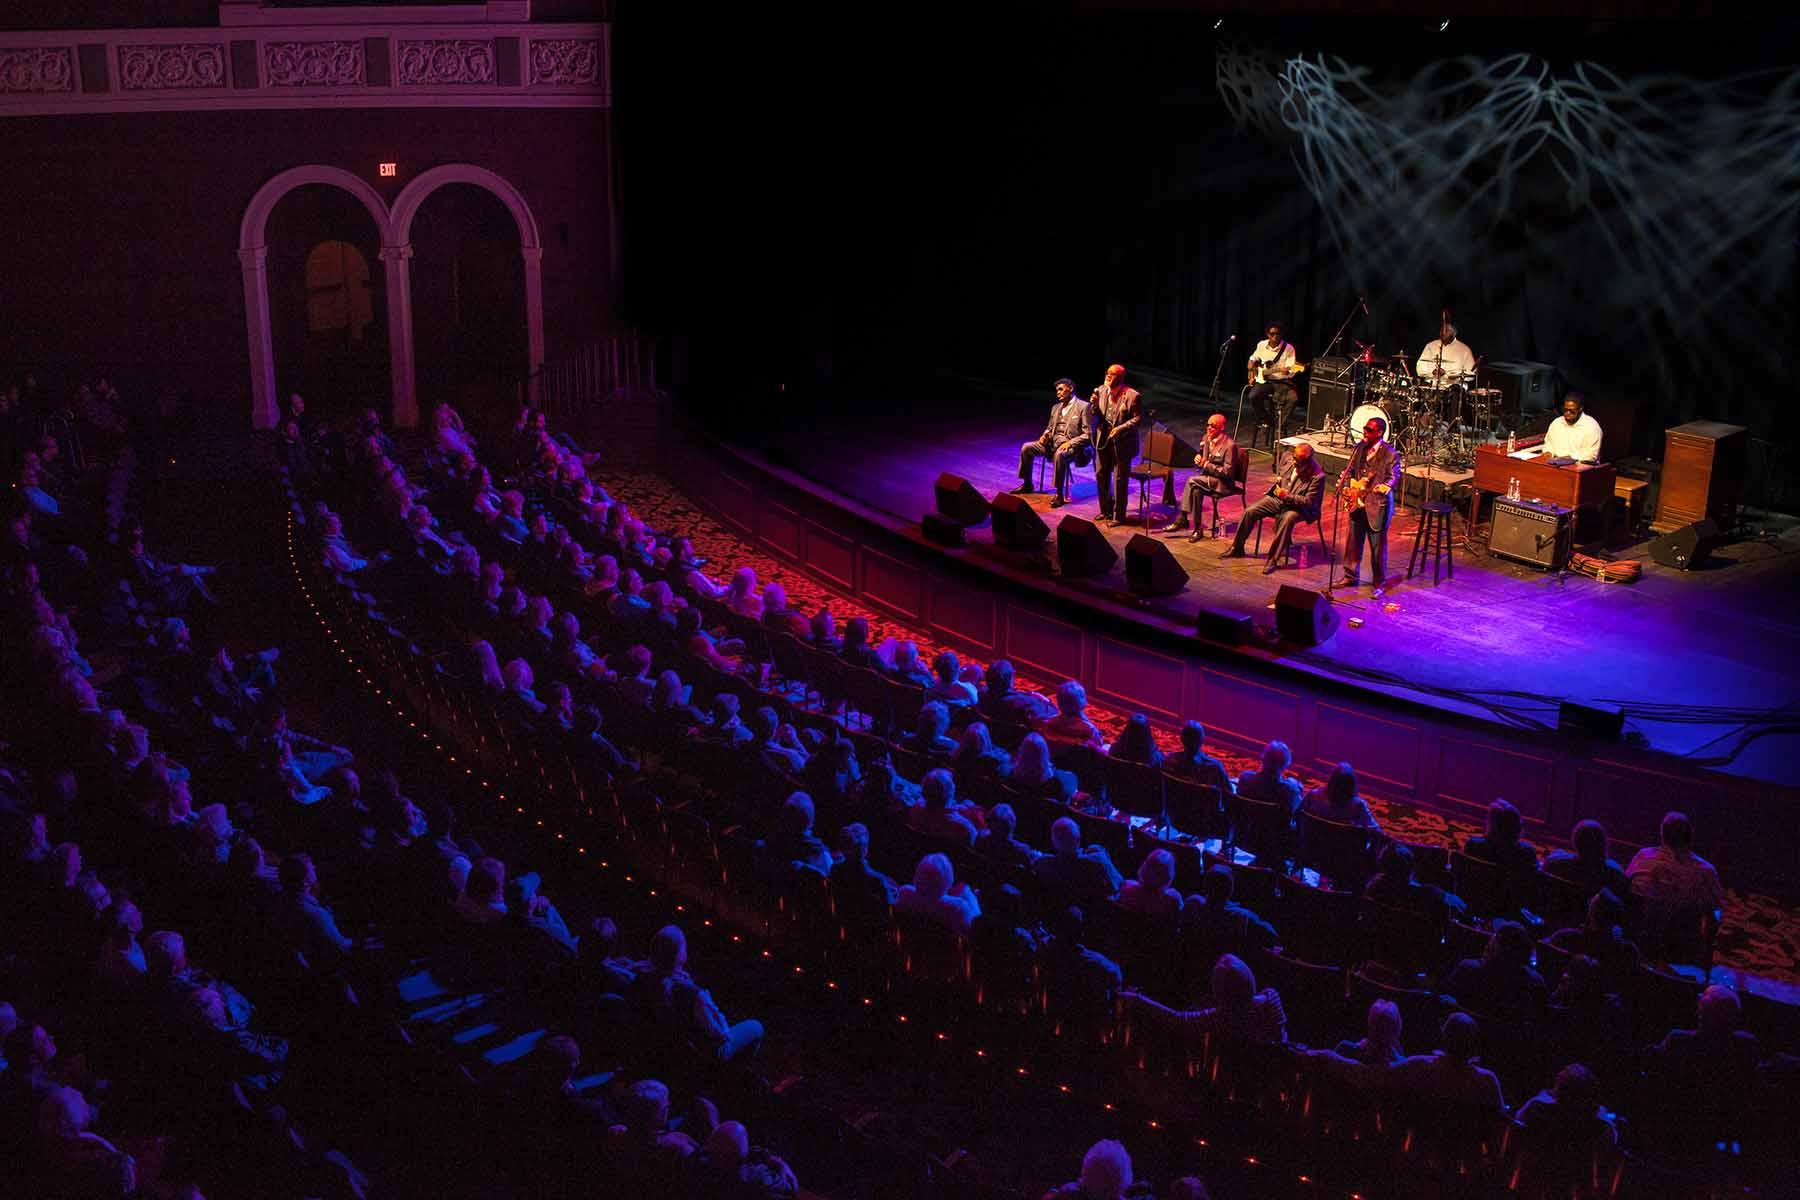 Photograph of the Blind Boys of Alabama performance at Templeton-Blackburn Memorial Auditorium on the Ohio University Campus in Athens, Ohio on Nov. 14, 2015